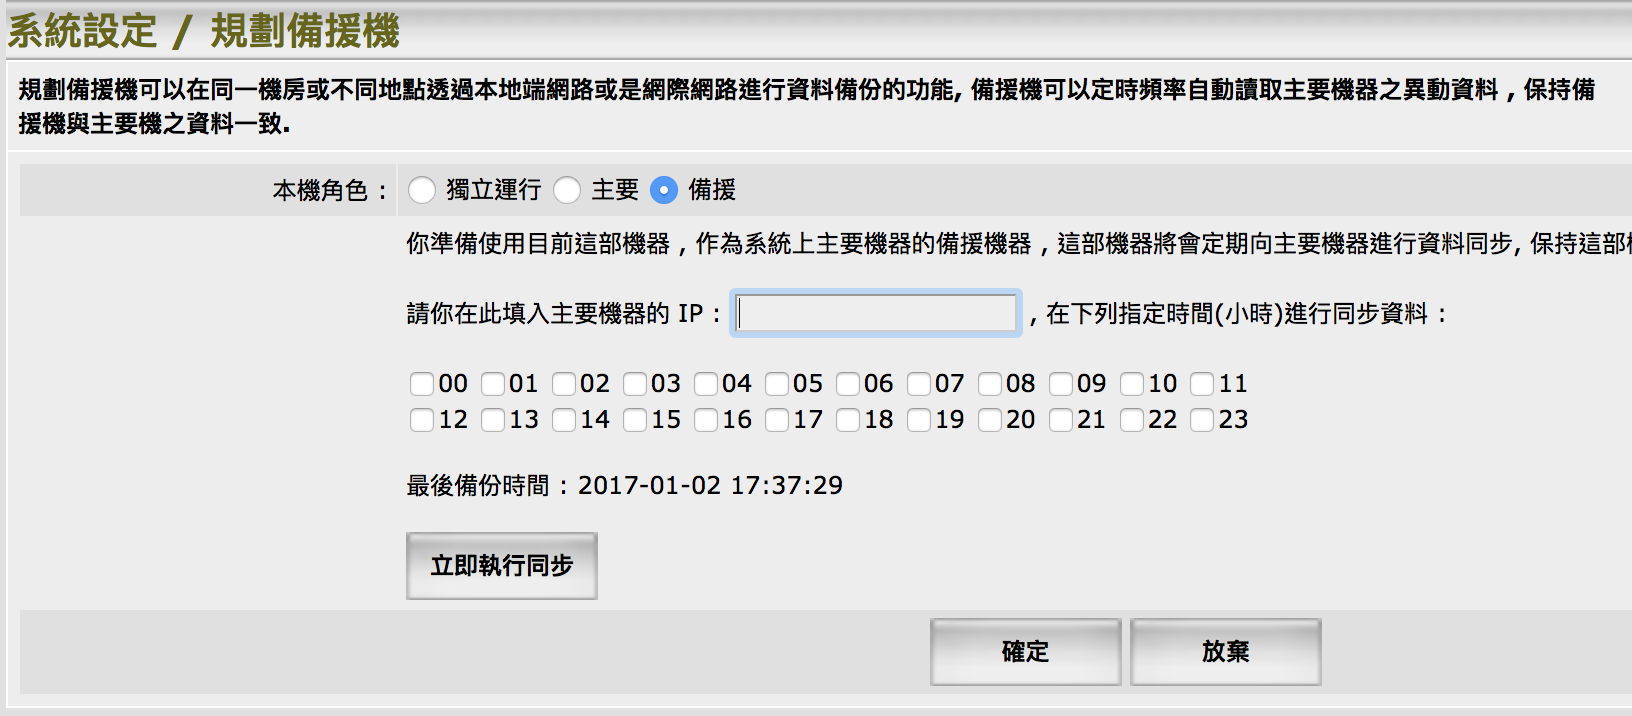 mxmail 電子郵件主備援設定